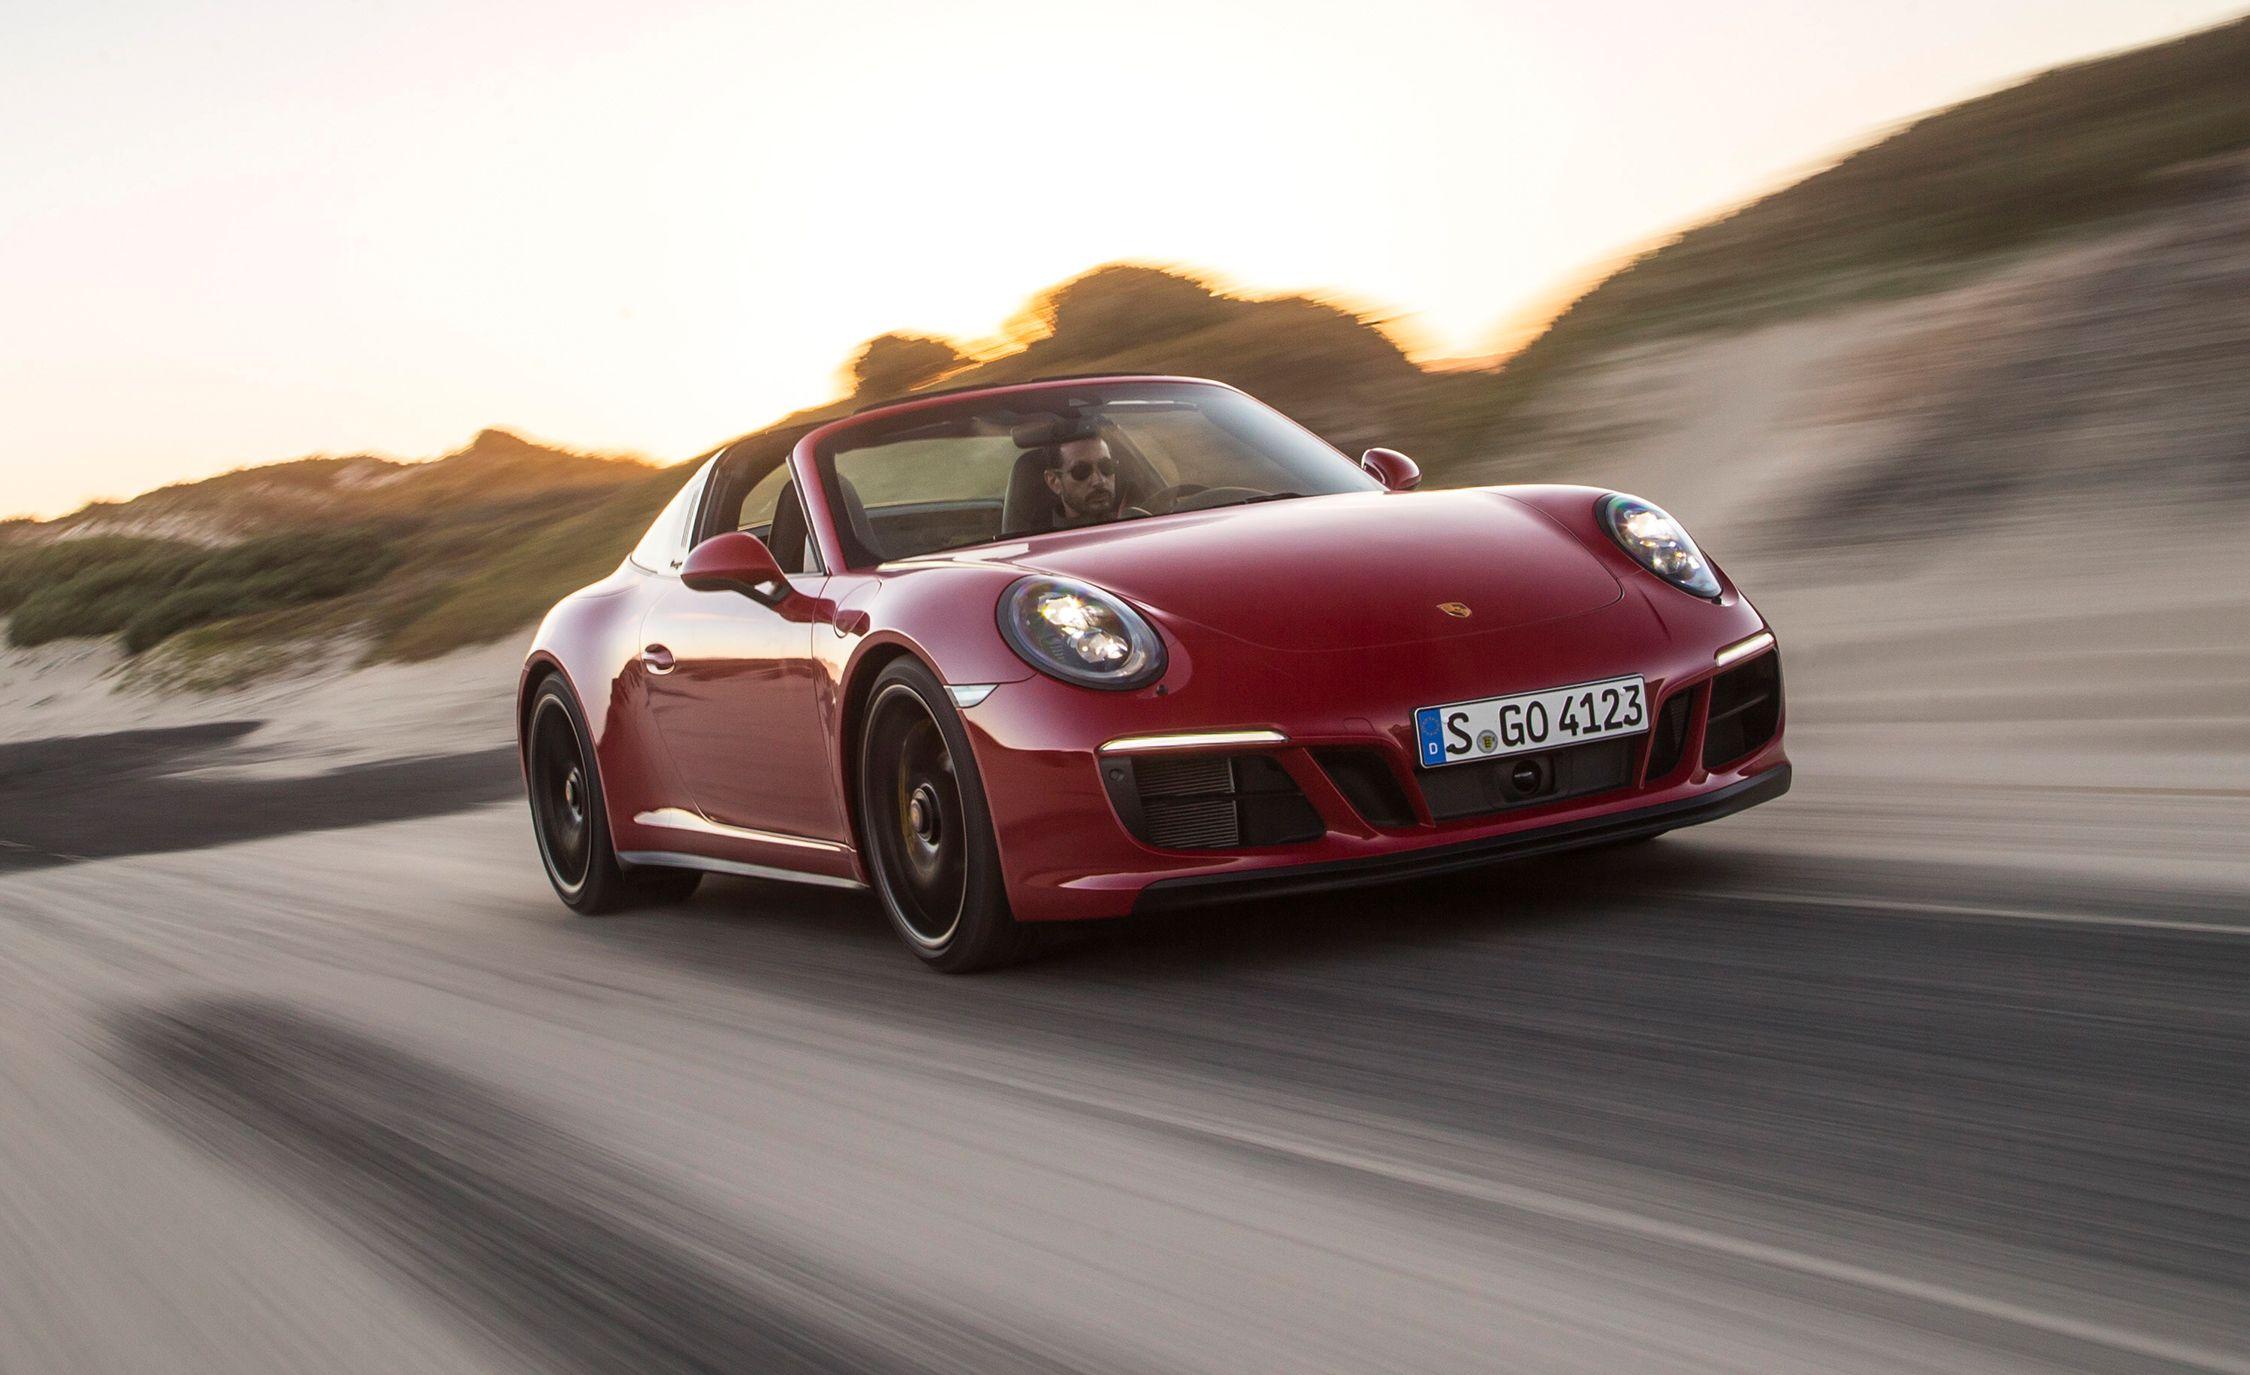 2018 Porsche 911 Targa 4 Gts First Drive Review Car And Driver